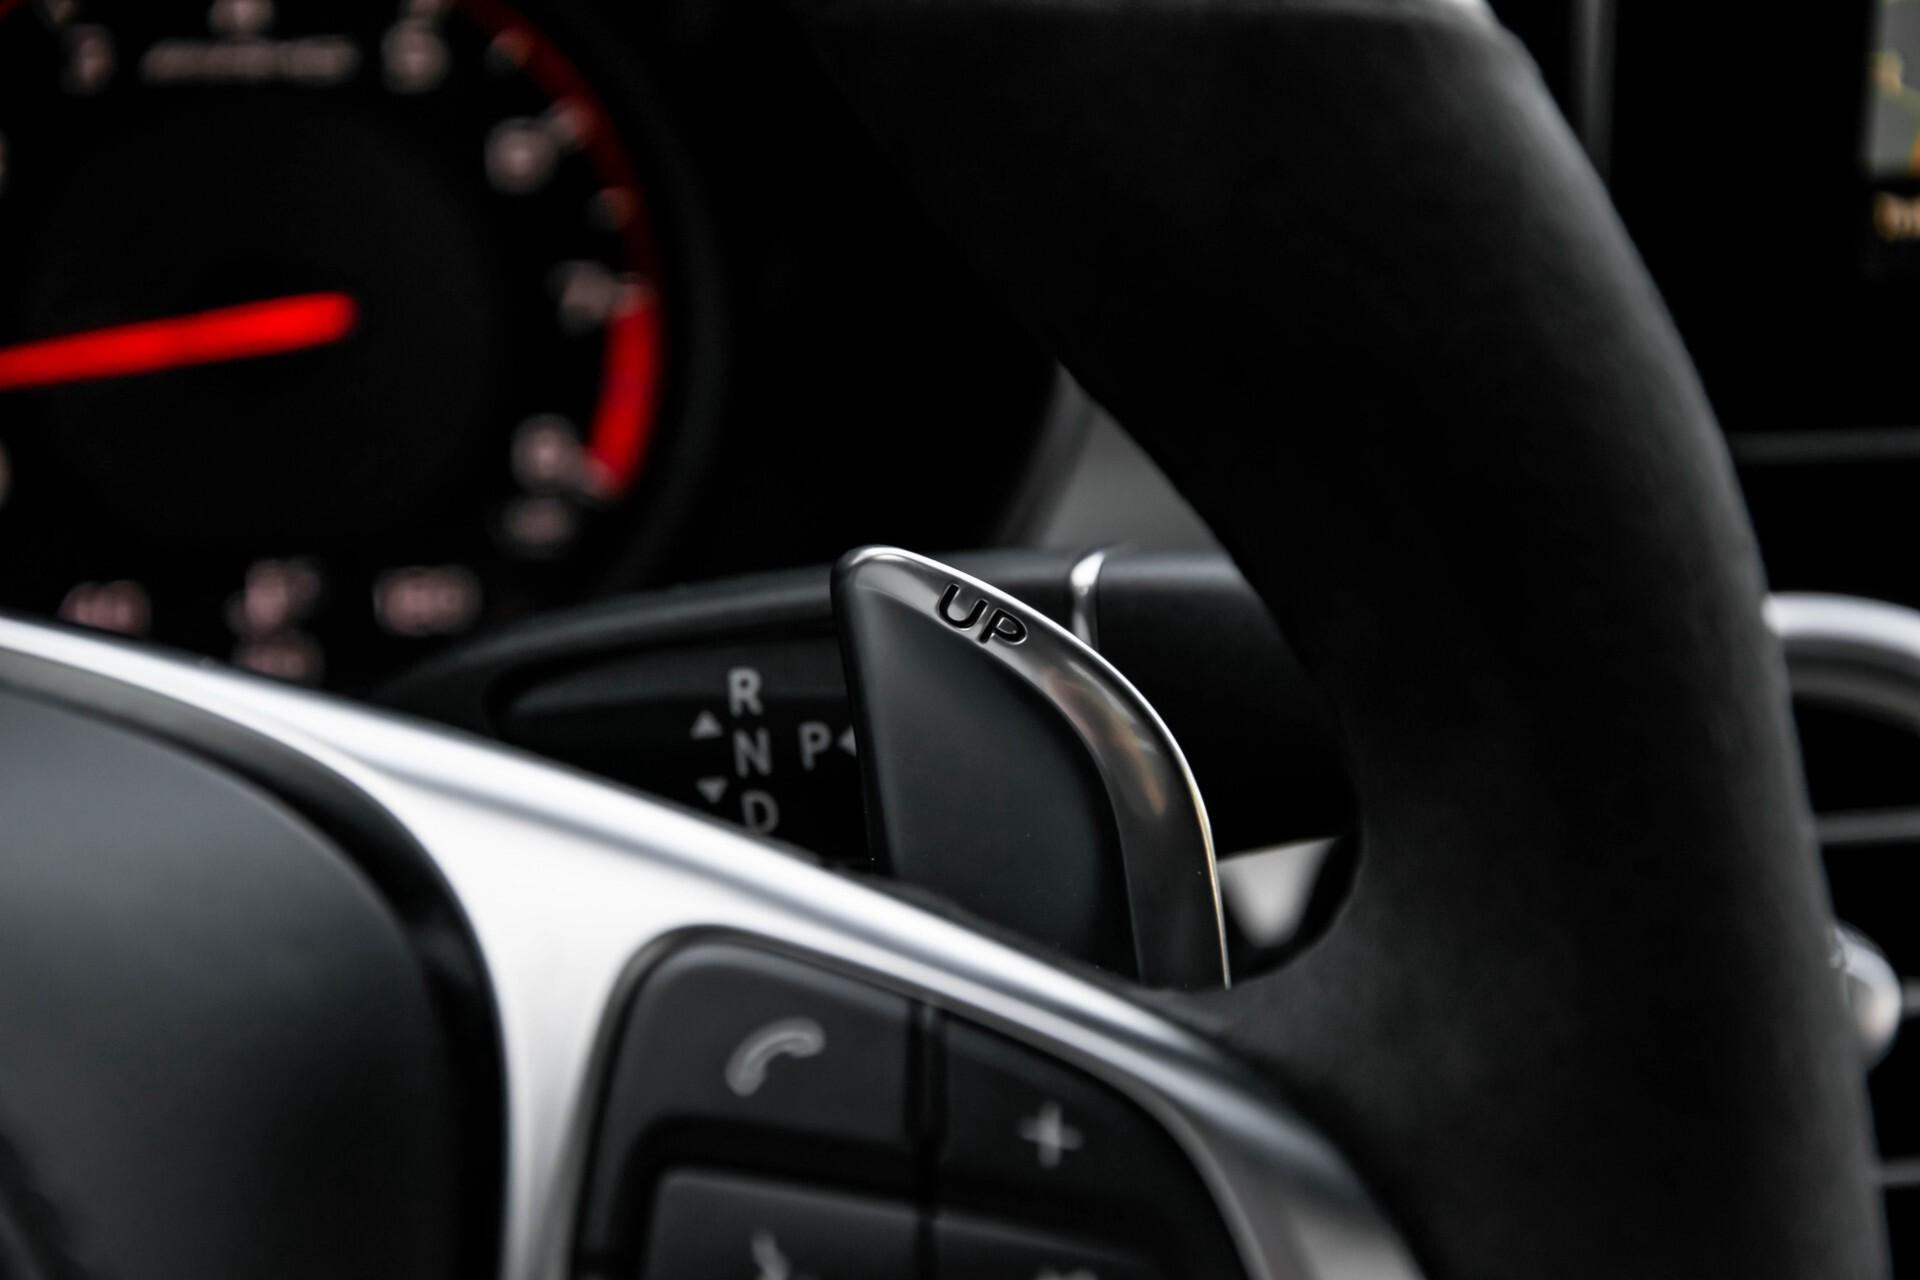 Mercedes-Benz C-Klasse 63 AMG S Panorama/Distronic/Keyless/Comand/Camera/ILS Aut7 Foto 12